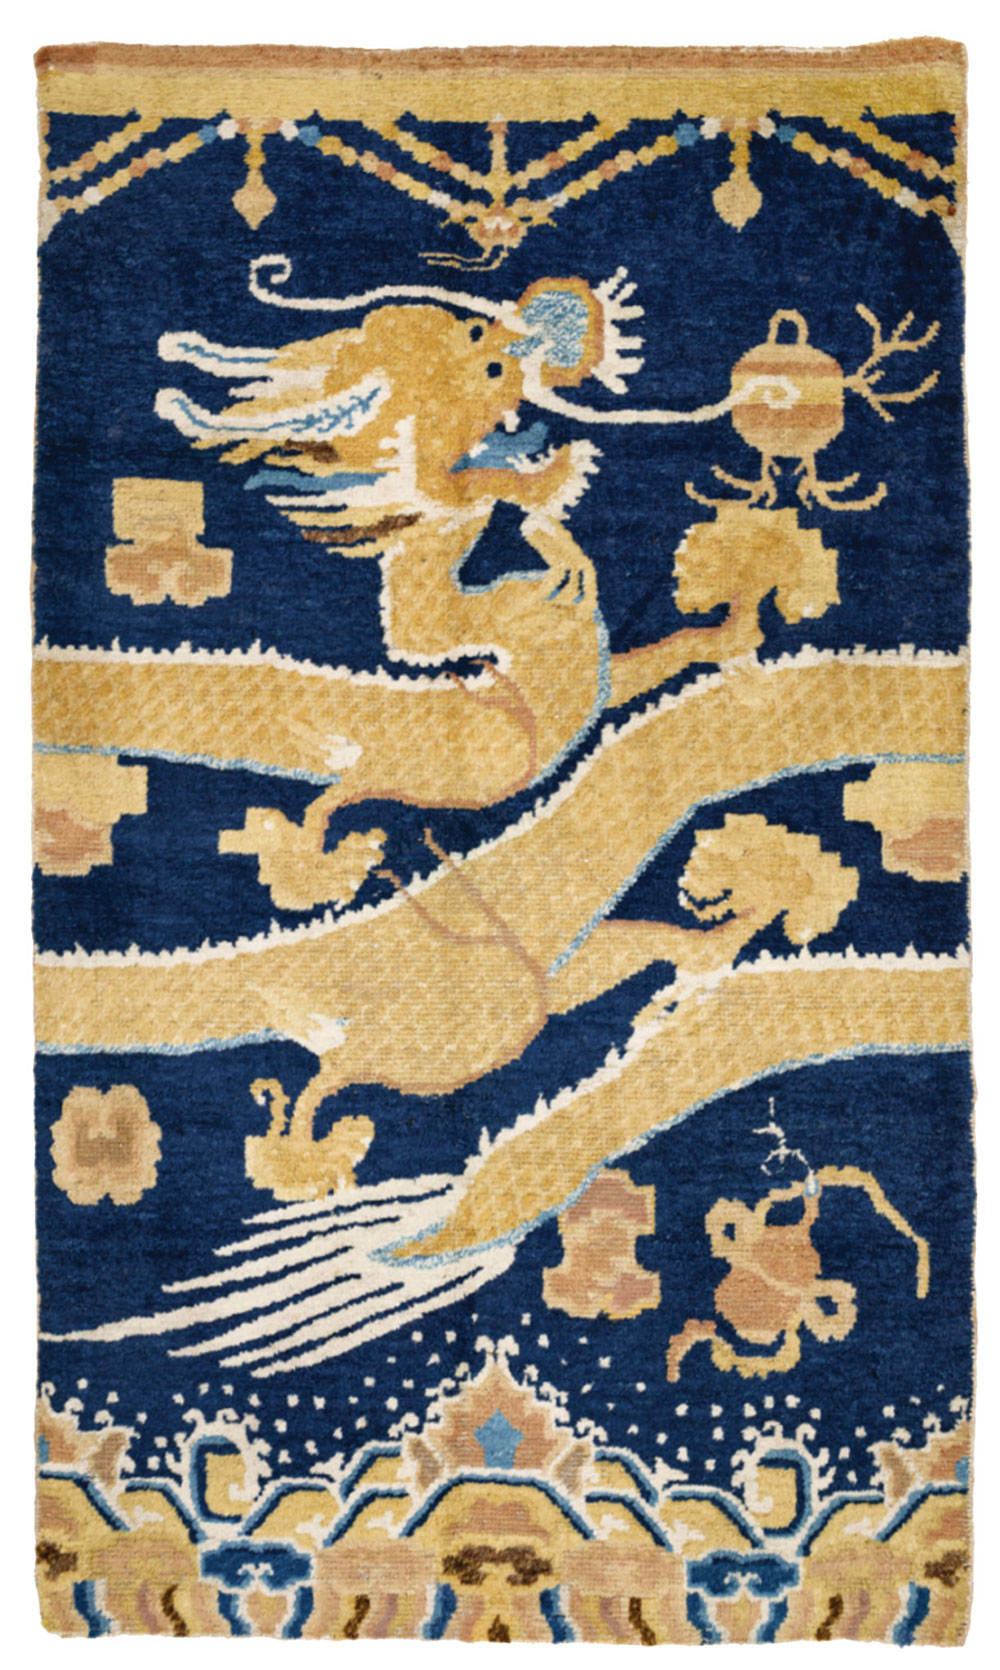 "Ningxia pillar rug Mid 19th century 0.94 x 1.57 m (3'0""x 5'2) Rippon Boswell Wiesbaden 27 June 2020, Lot 207 Est: €8,000 Sold: €12,500 ($14,025)"